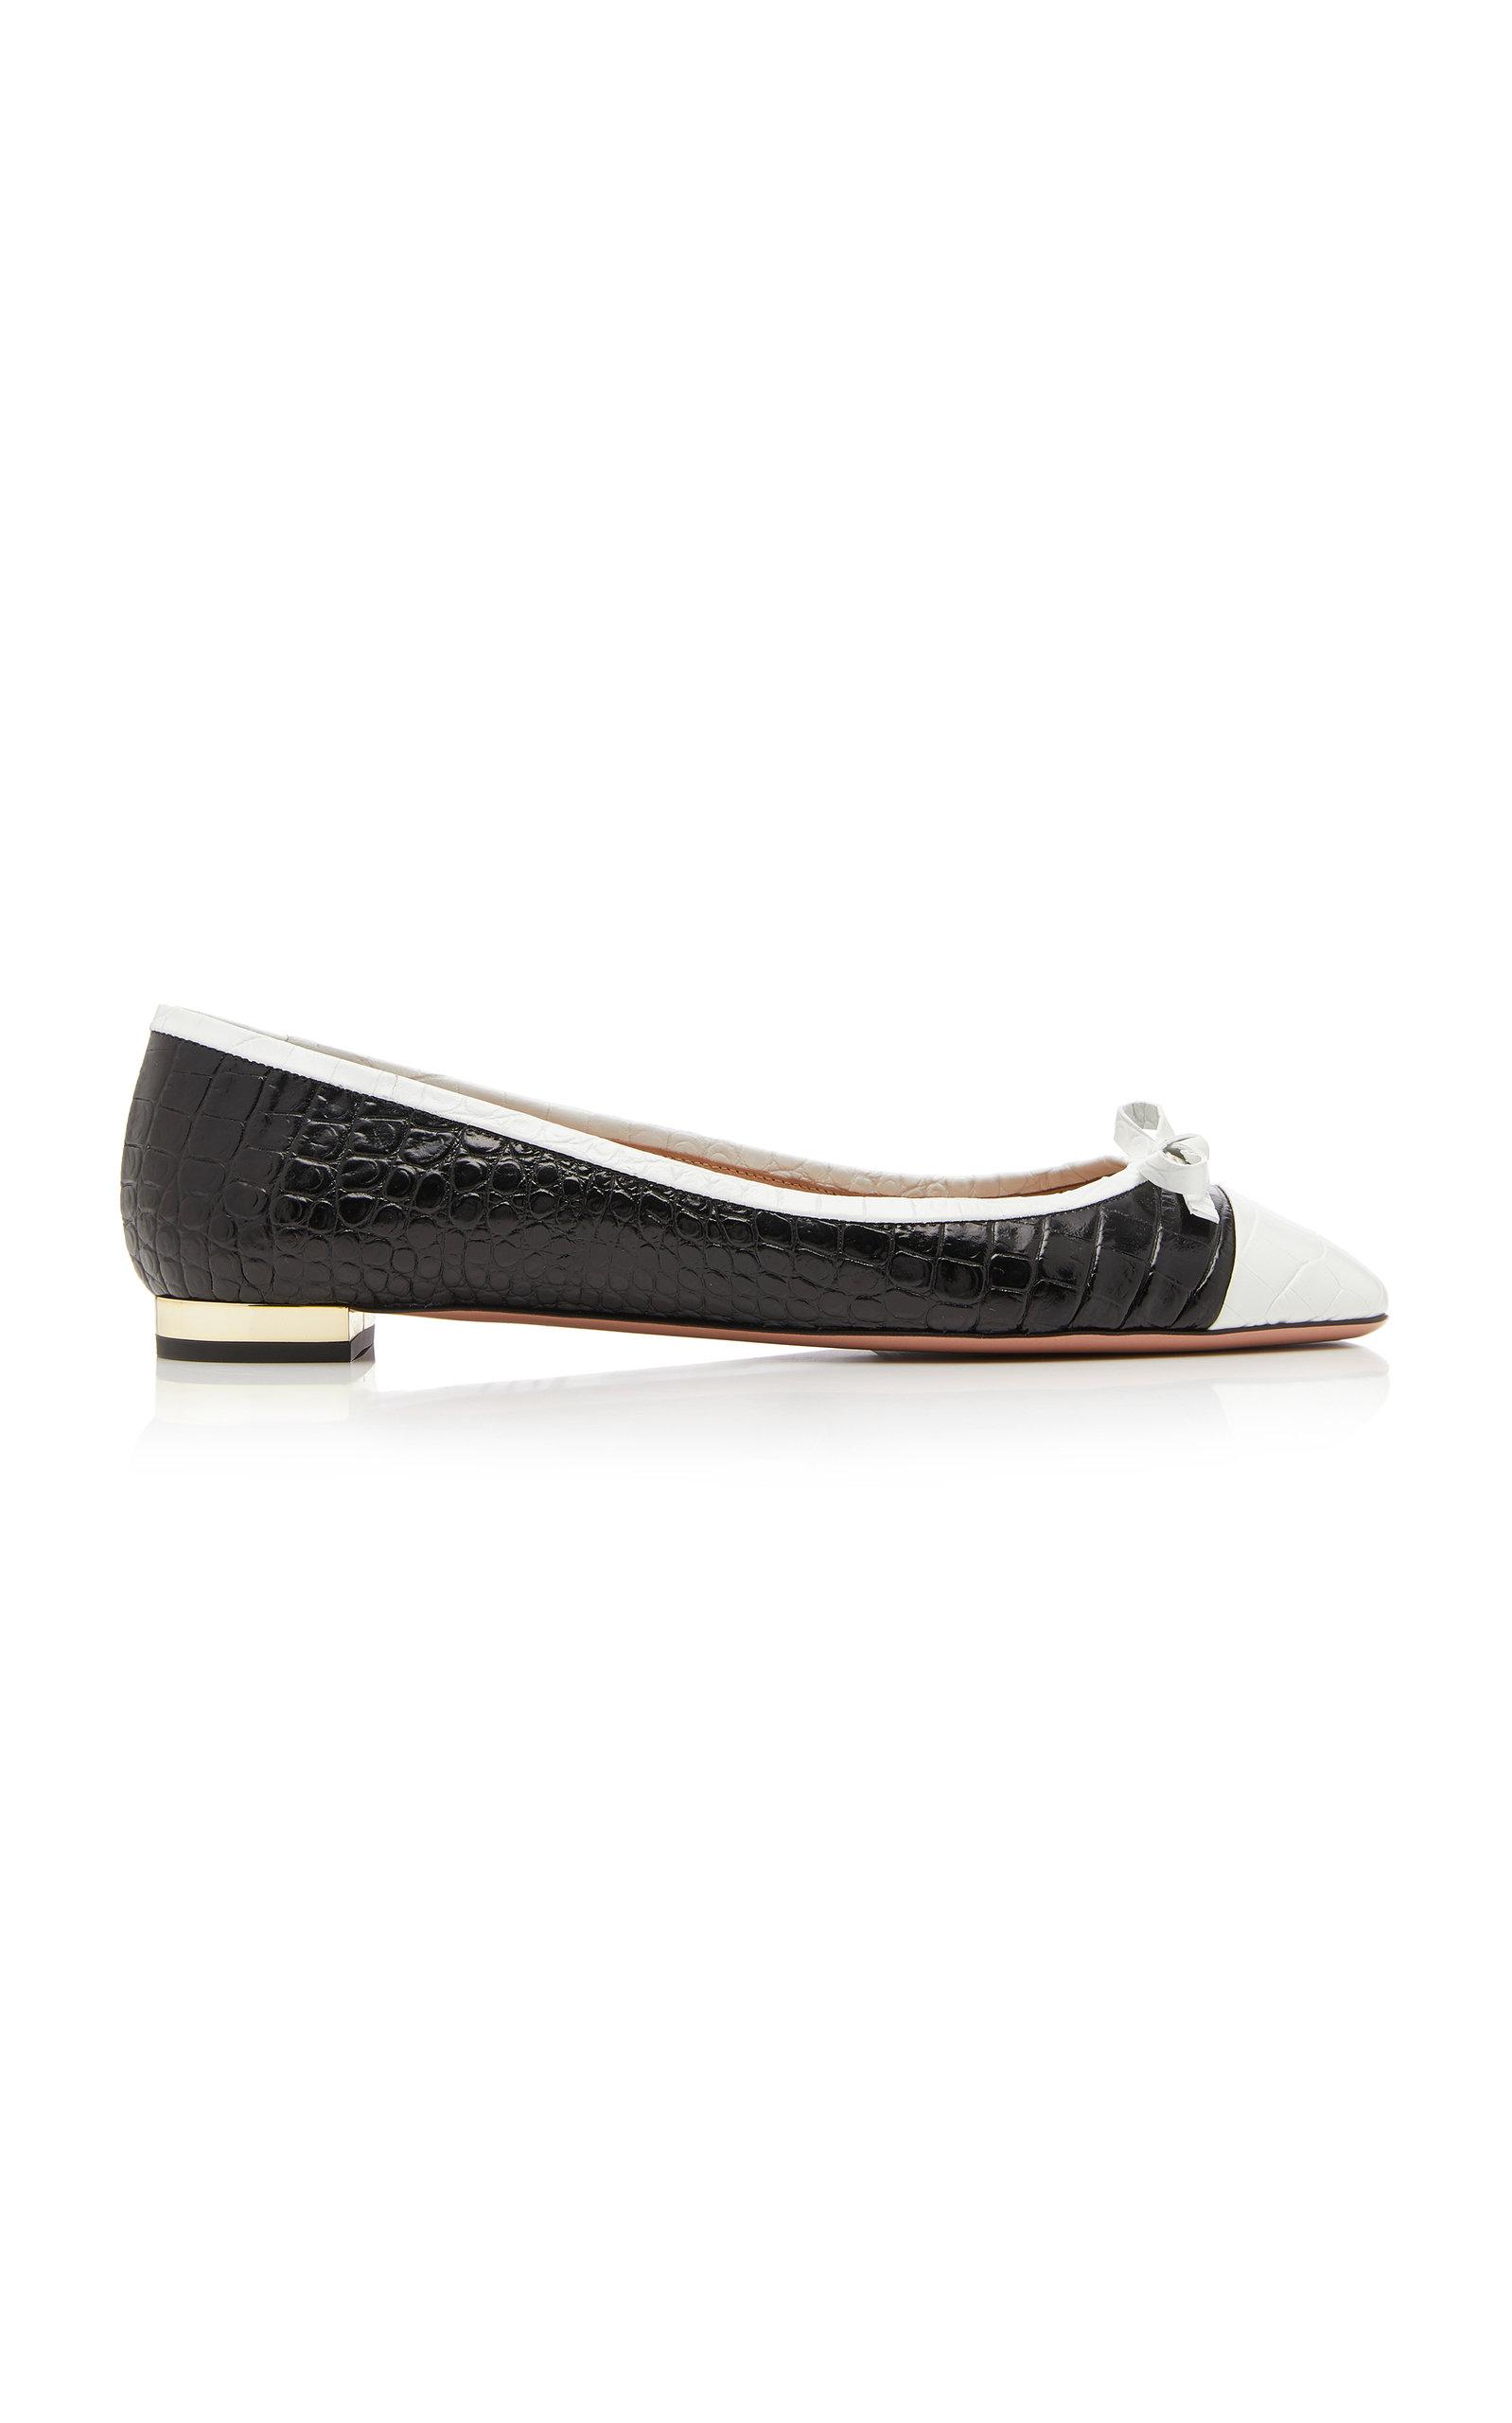 43f4e87411a01 AquazzuraMoss Two-Tone Croc-Effect Leather Ballet Flats. CLOSE. Loading